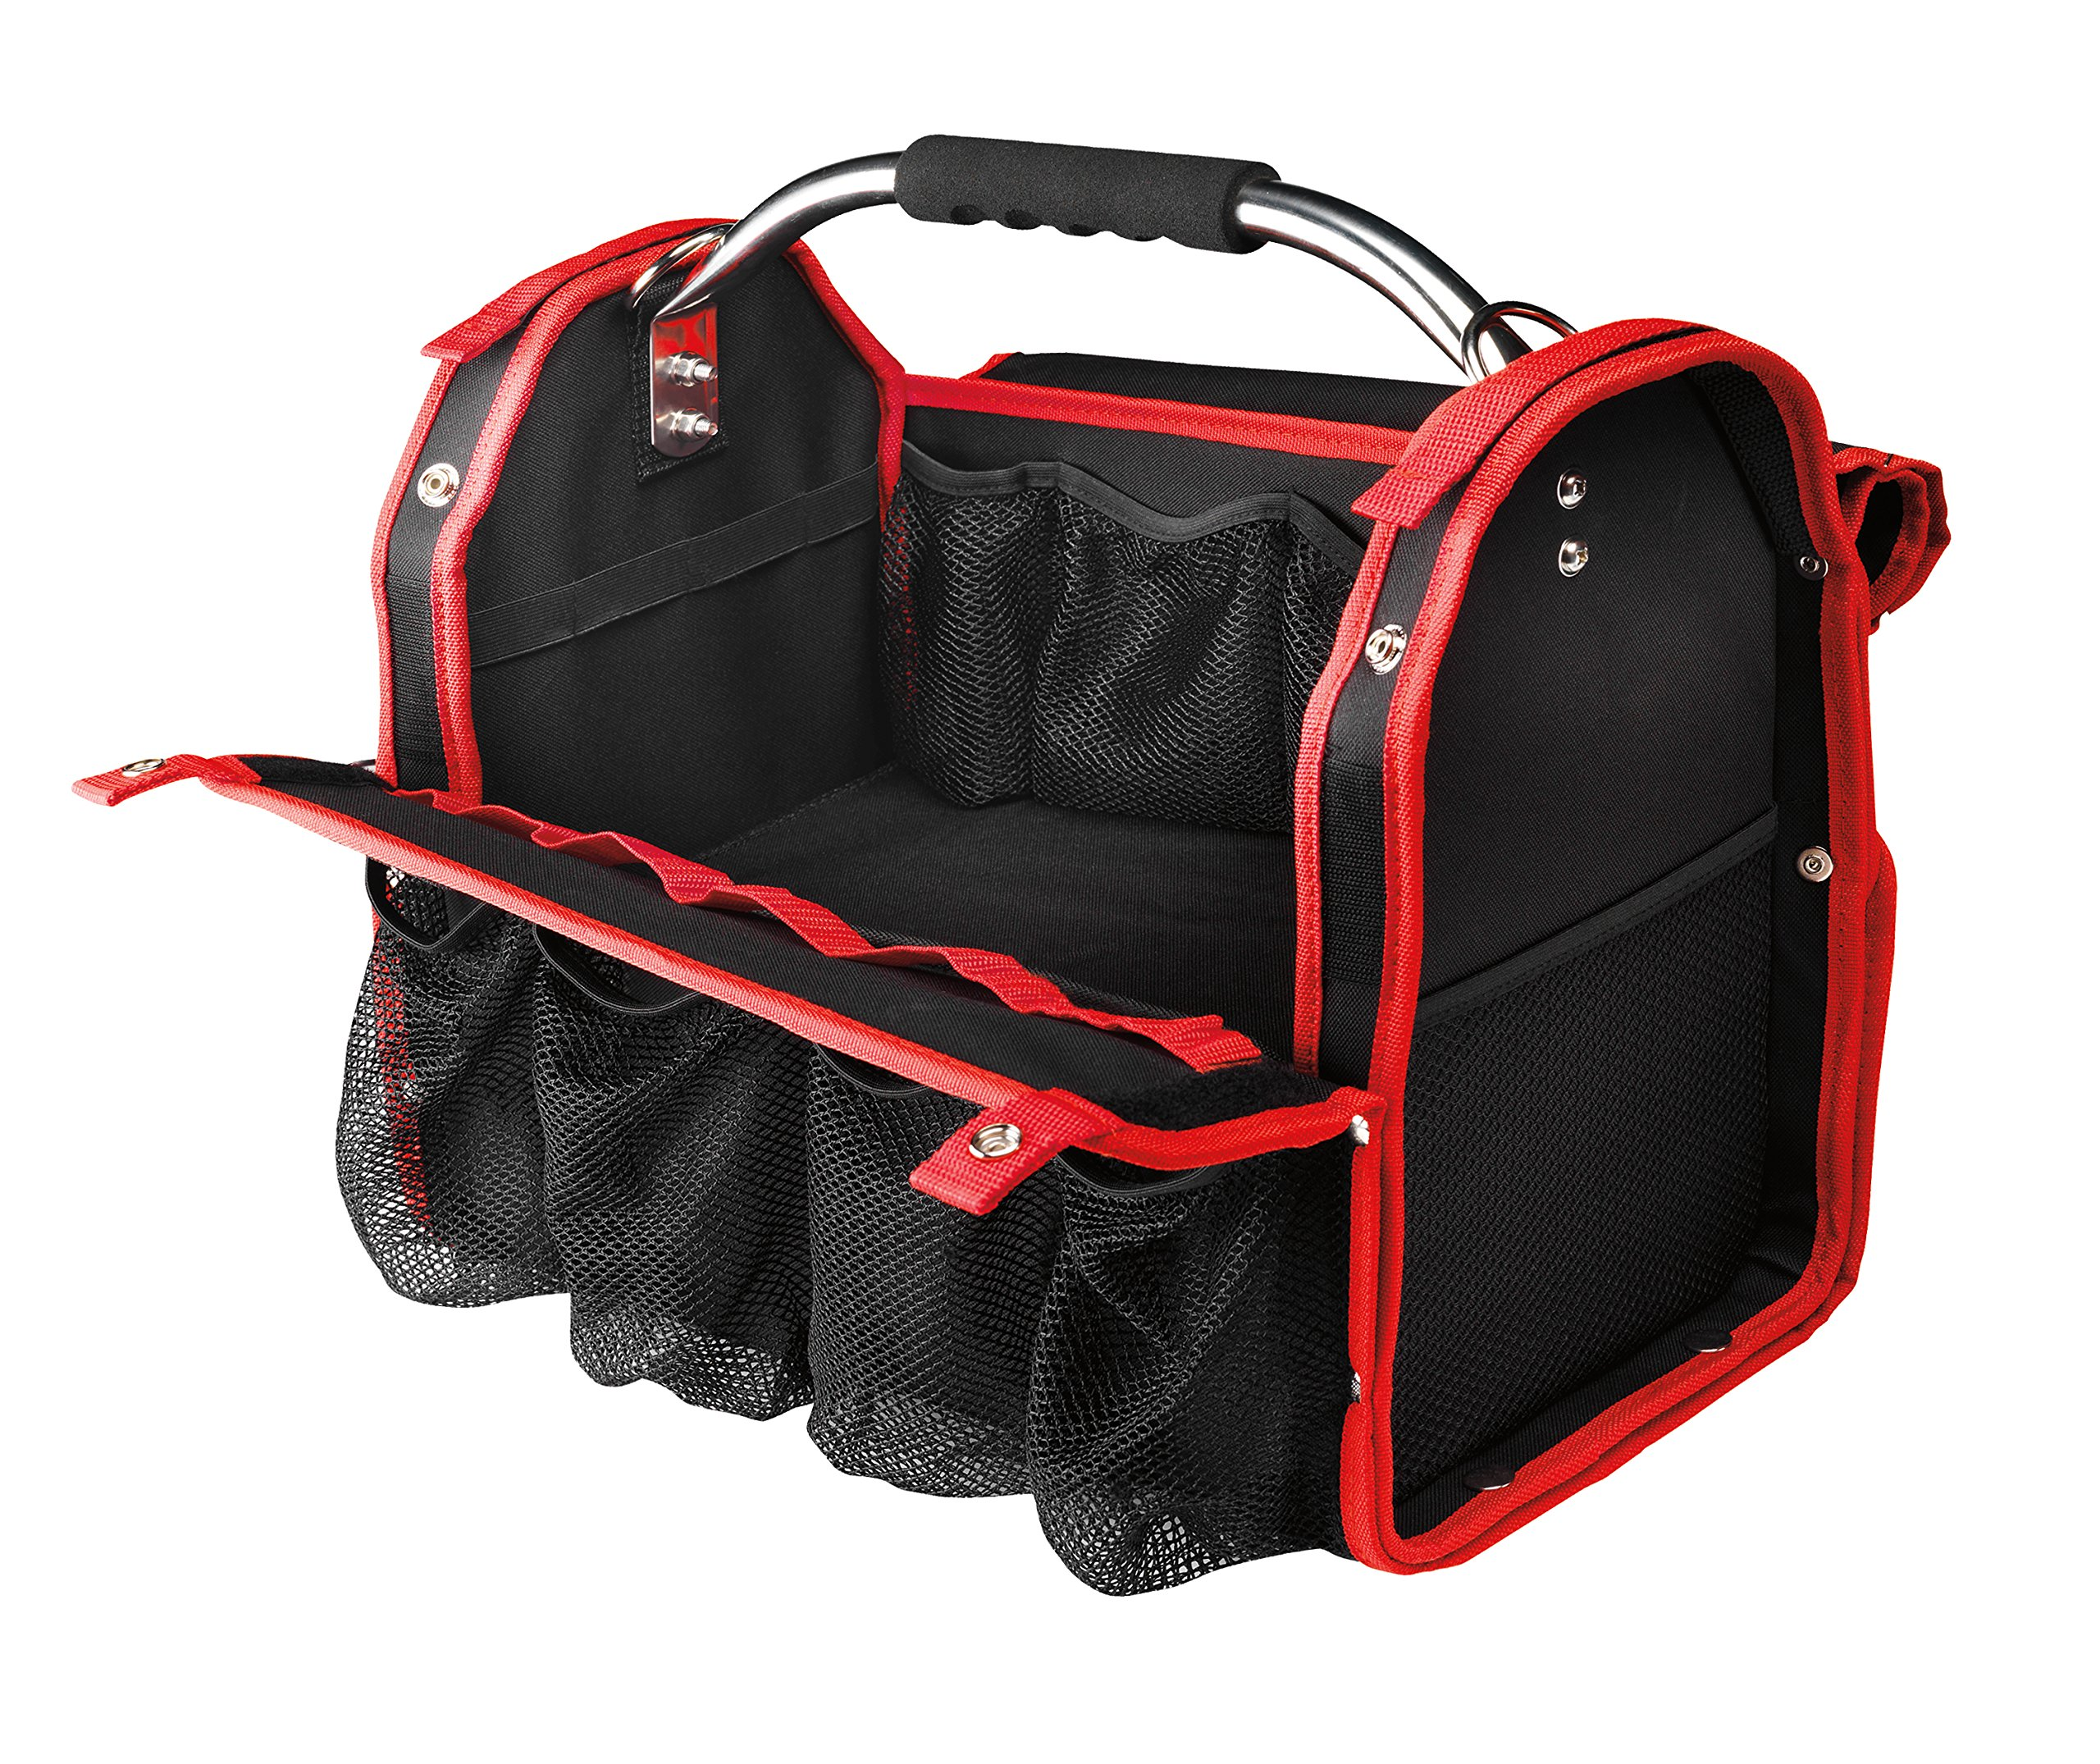 Griot's Garage 92205 Car Care Organizer Bag by Griot's Garage